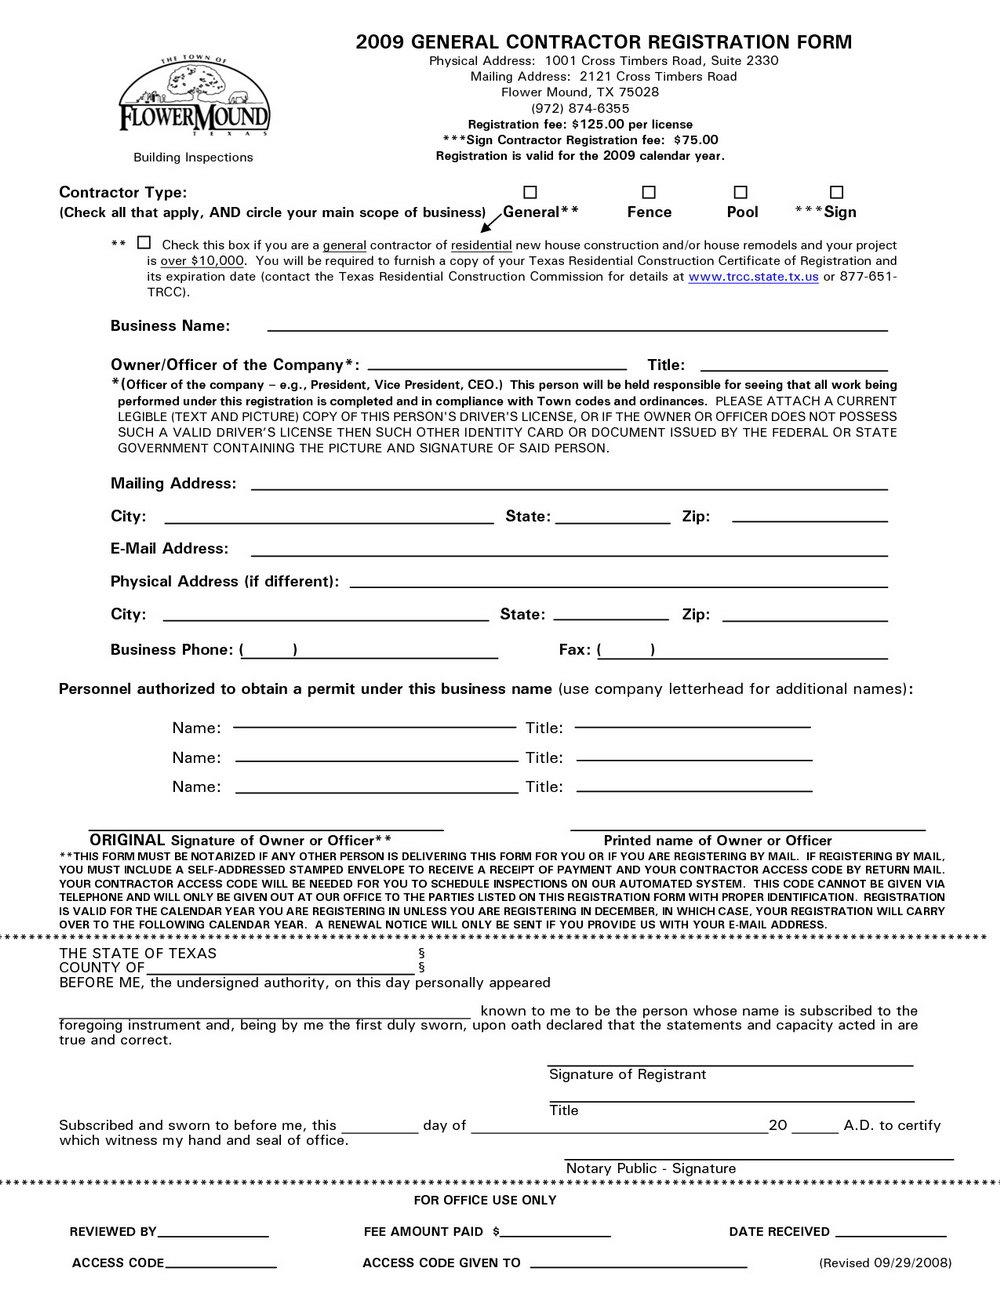 Consultant Contract Template Australia